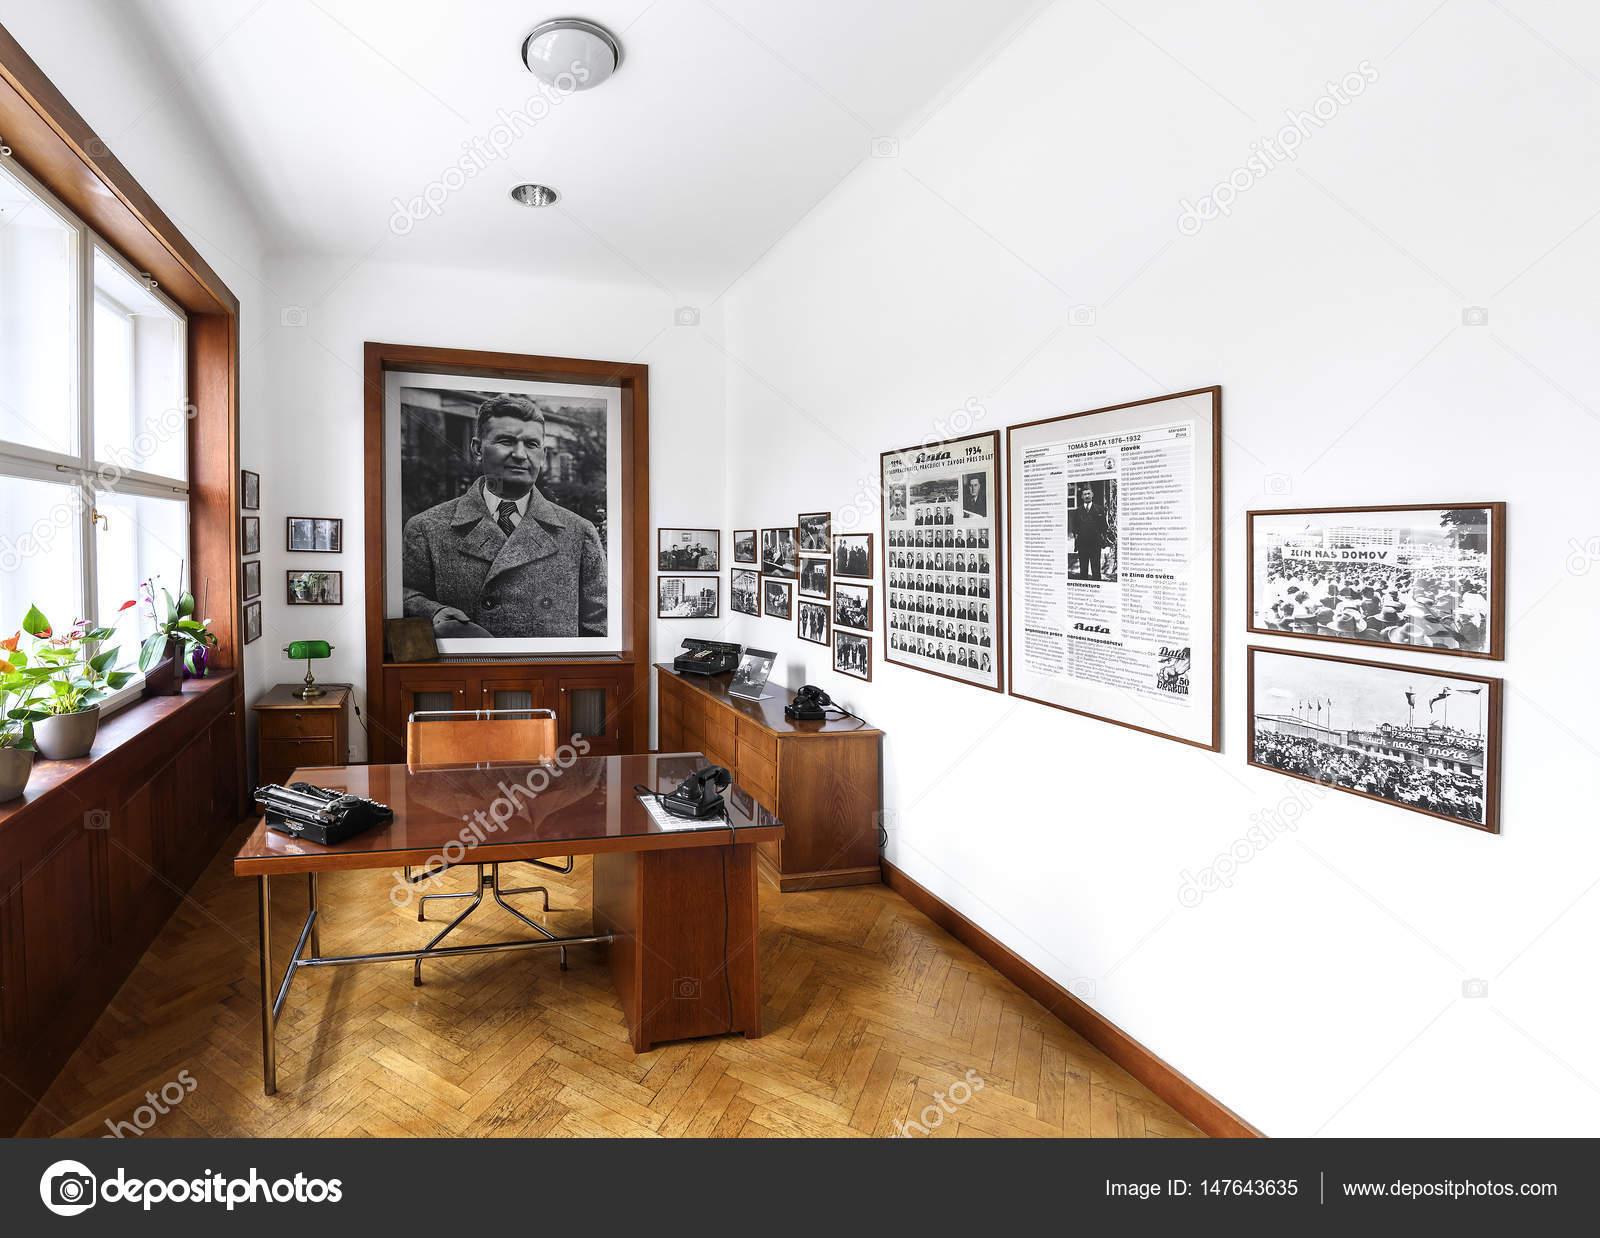 Lovely Home Design Zlín Part - 13: Building Belongs To The Thomas Bata Foundation U2014 Photo By Blazinek28